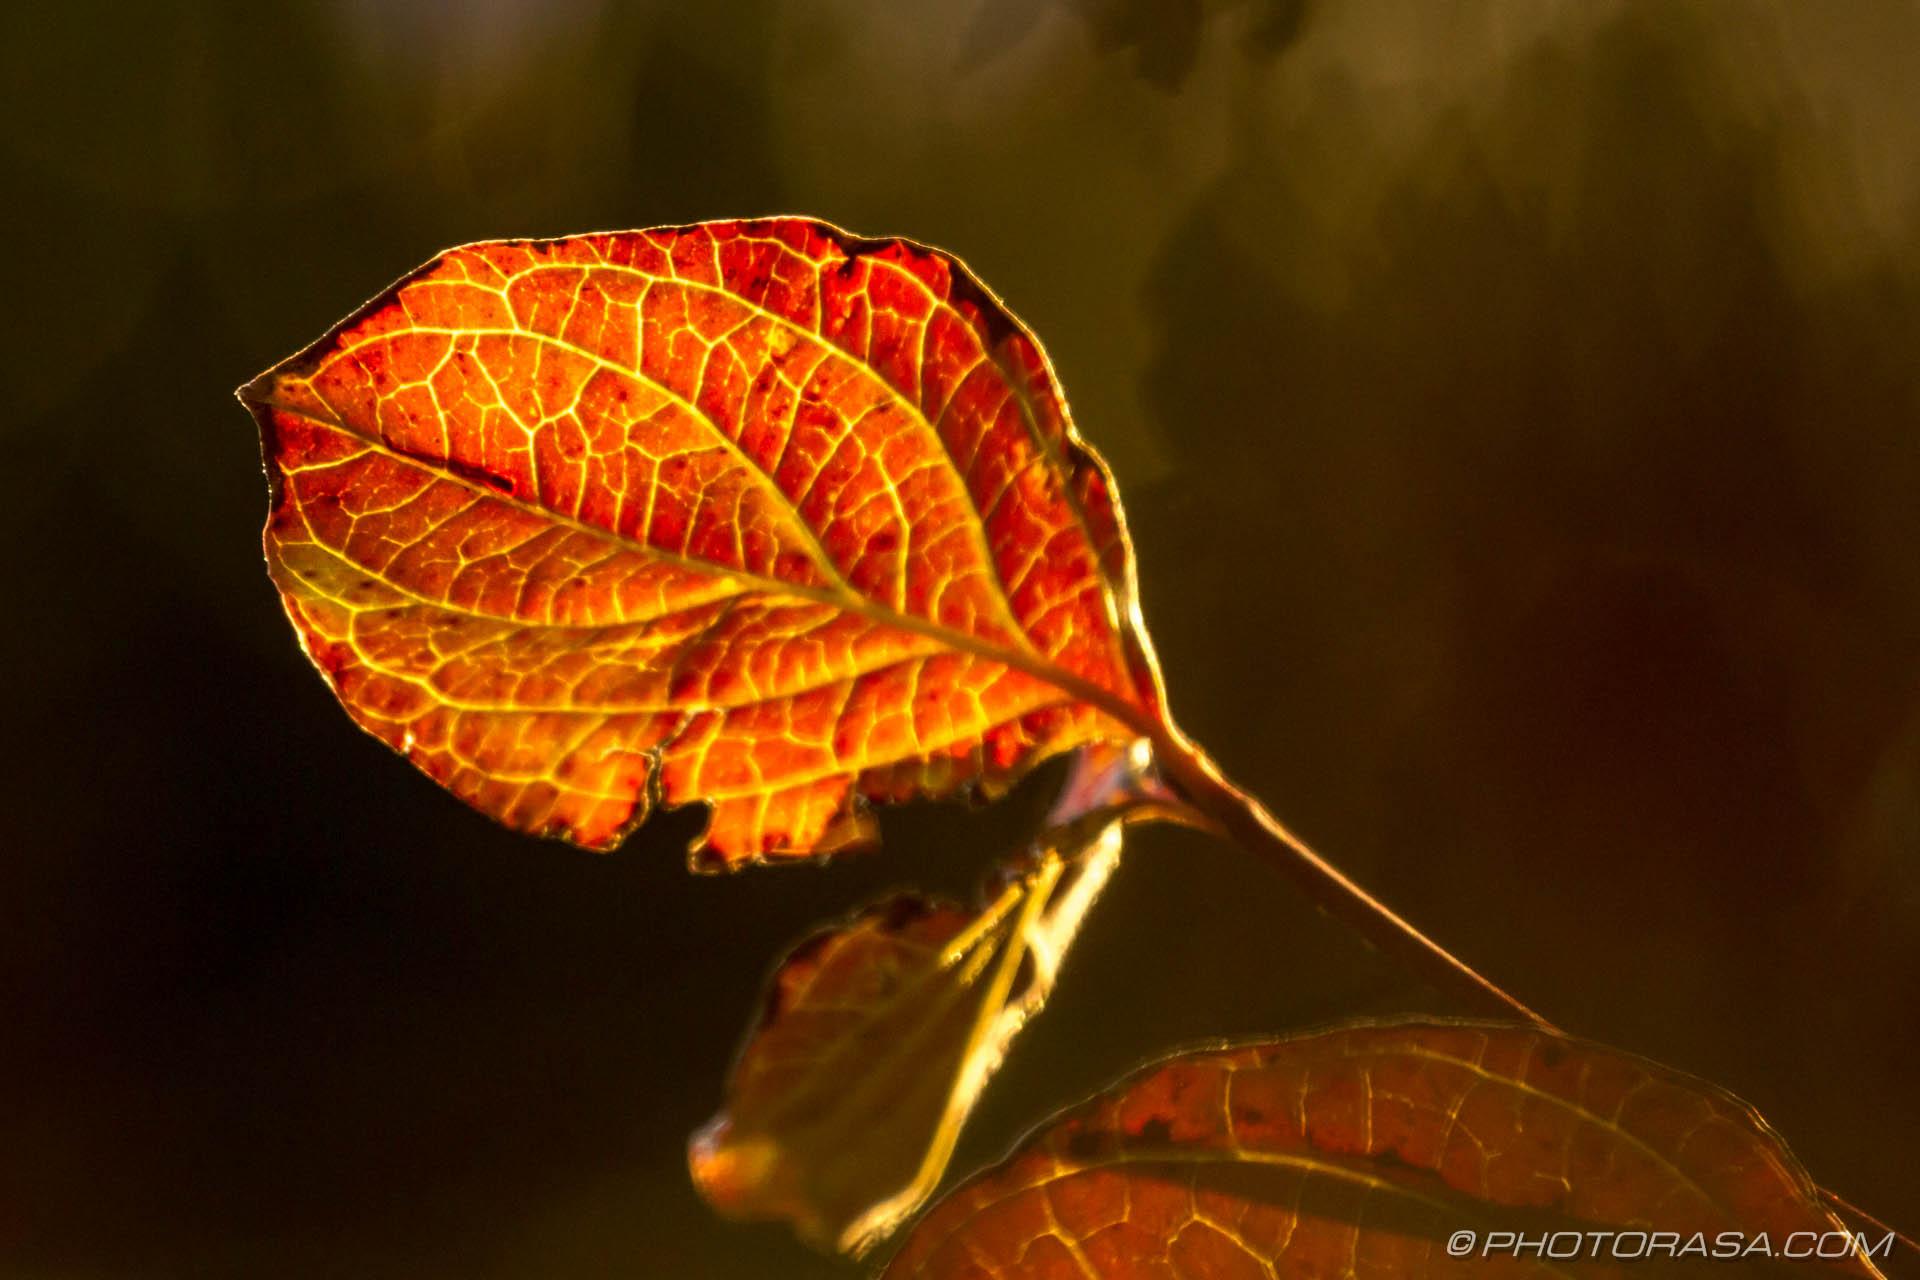 http://photorasa.com/autumn-leaves-sunlight/backlight-brown-red-dogwood-leaf/